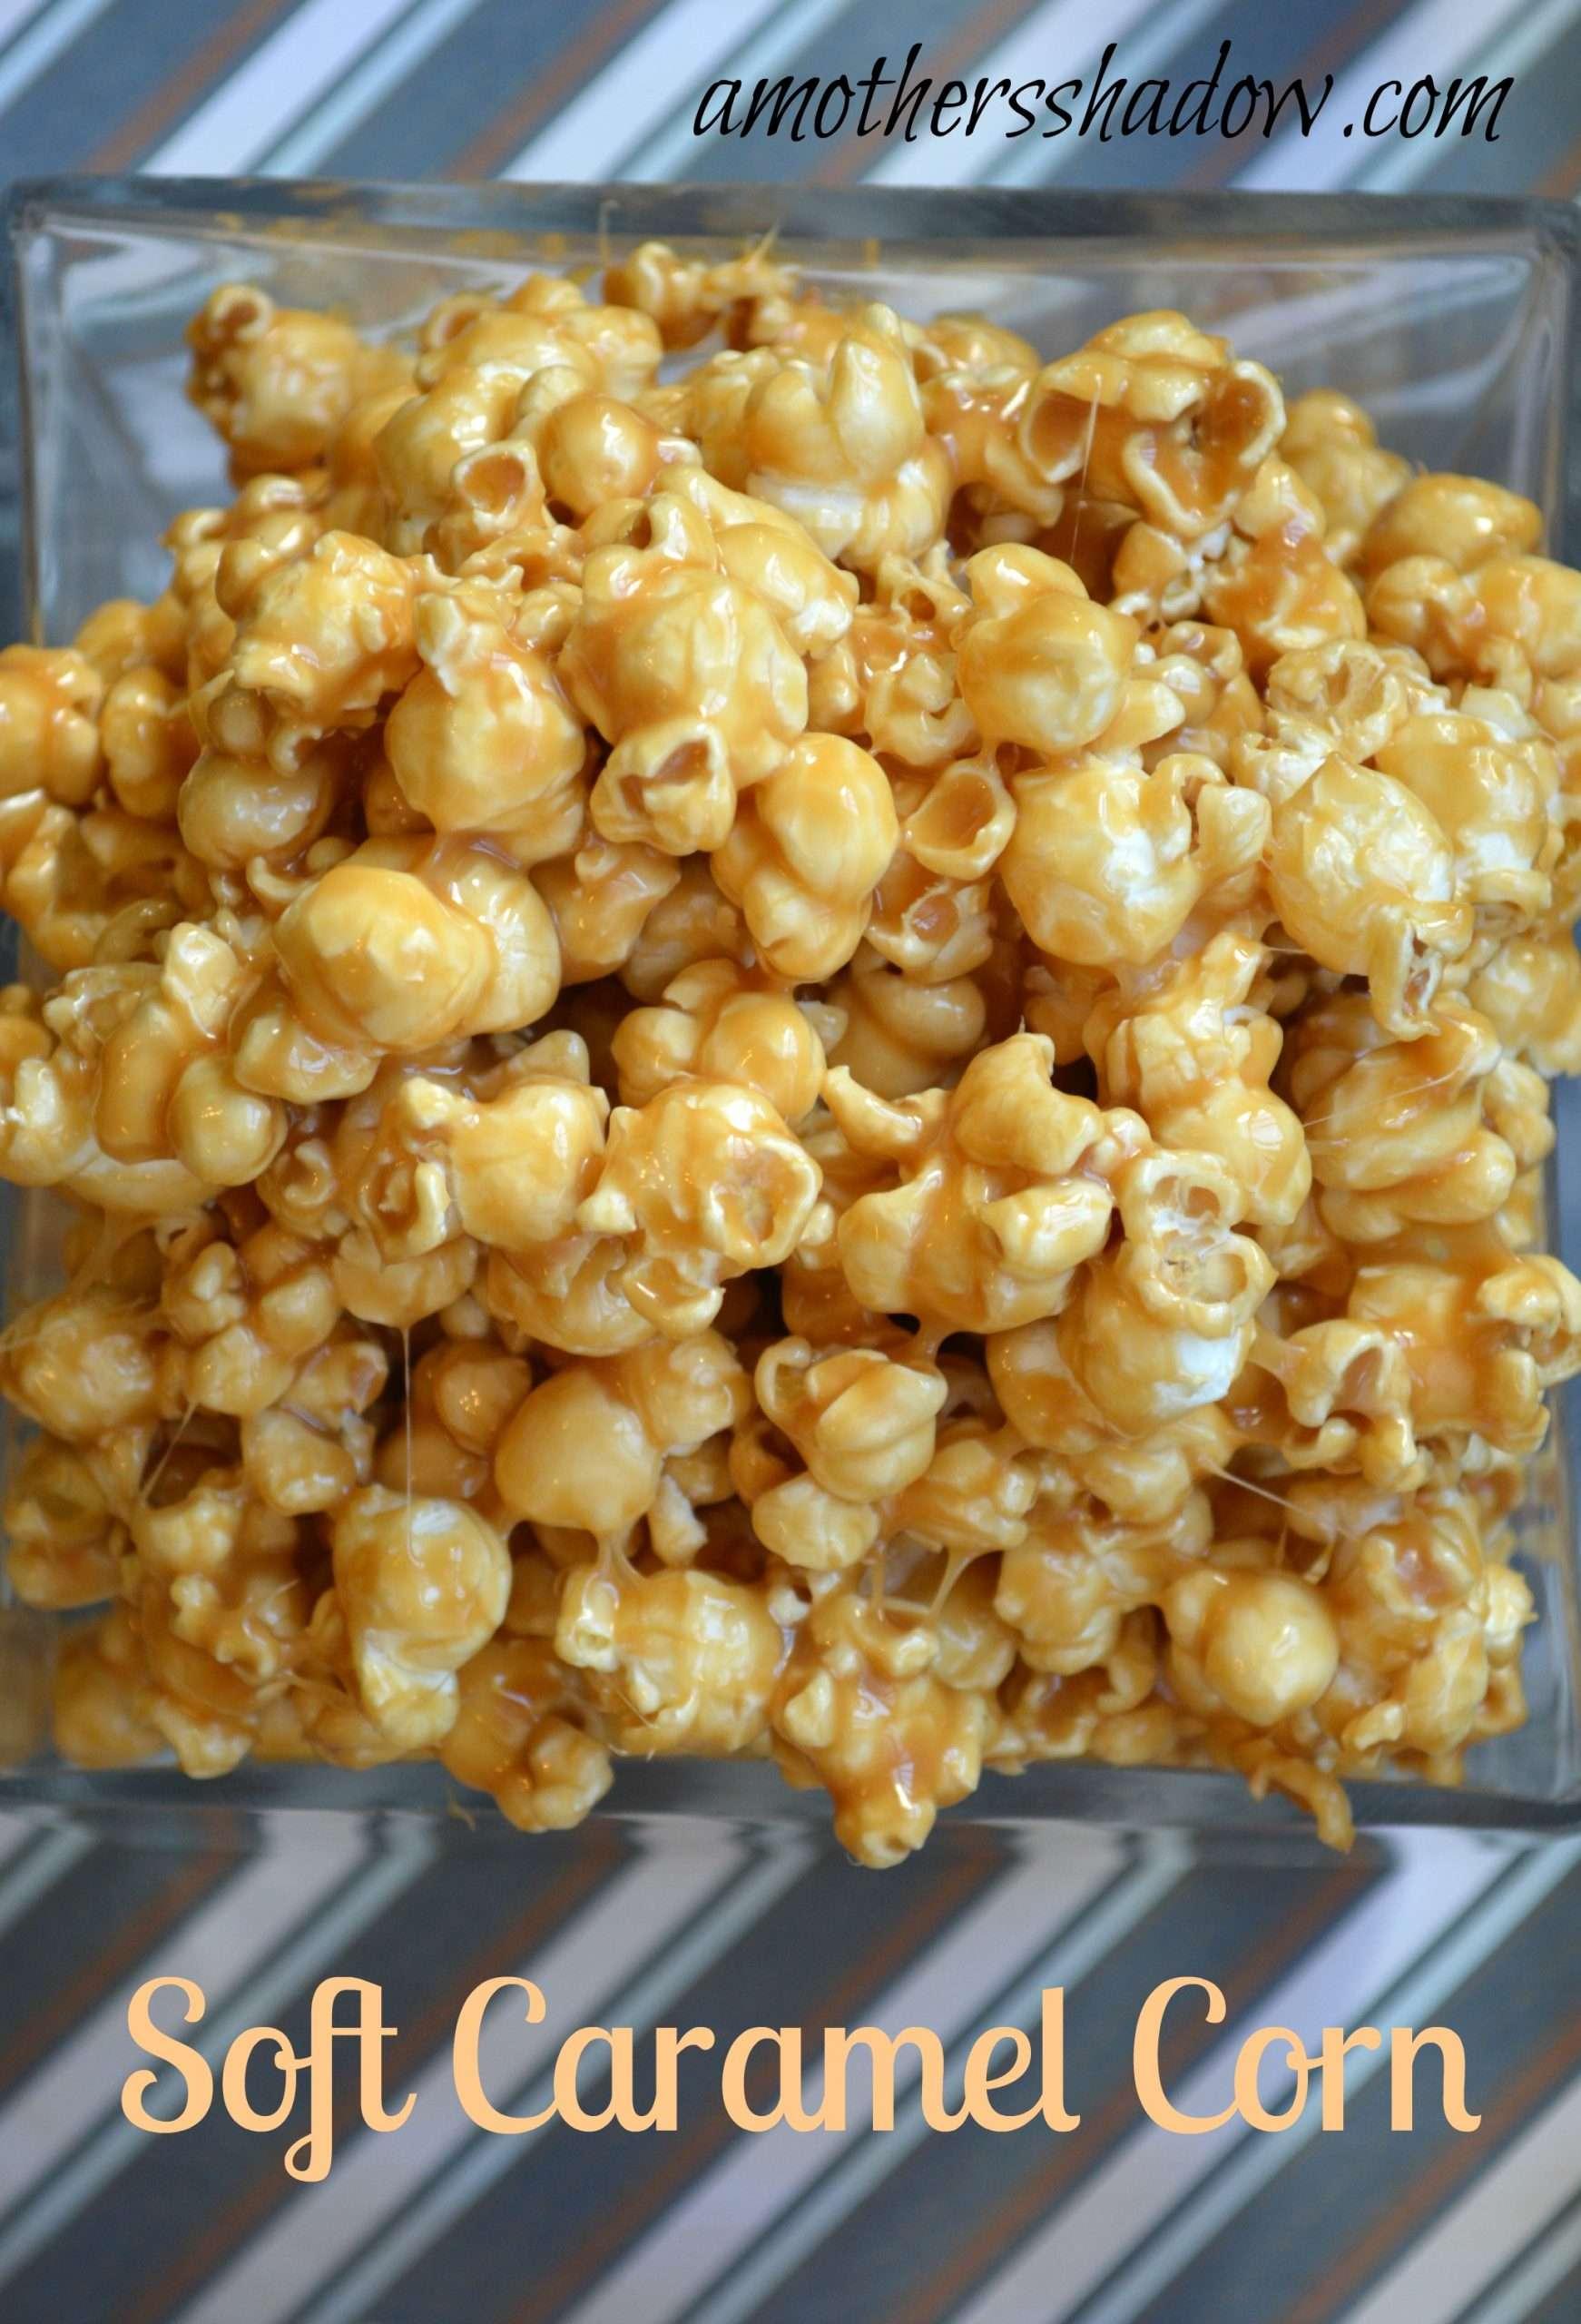 Soft and Creamy Caramel Corn